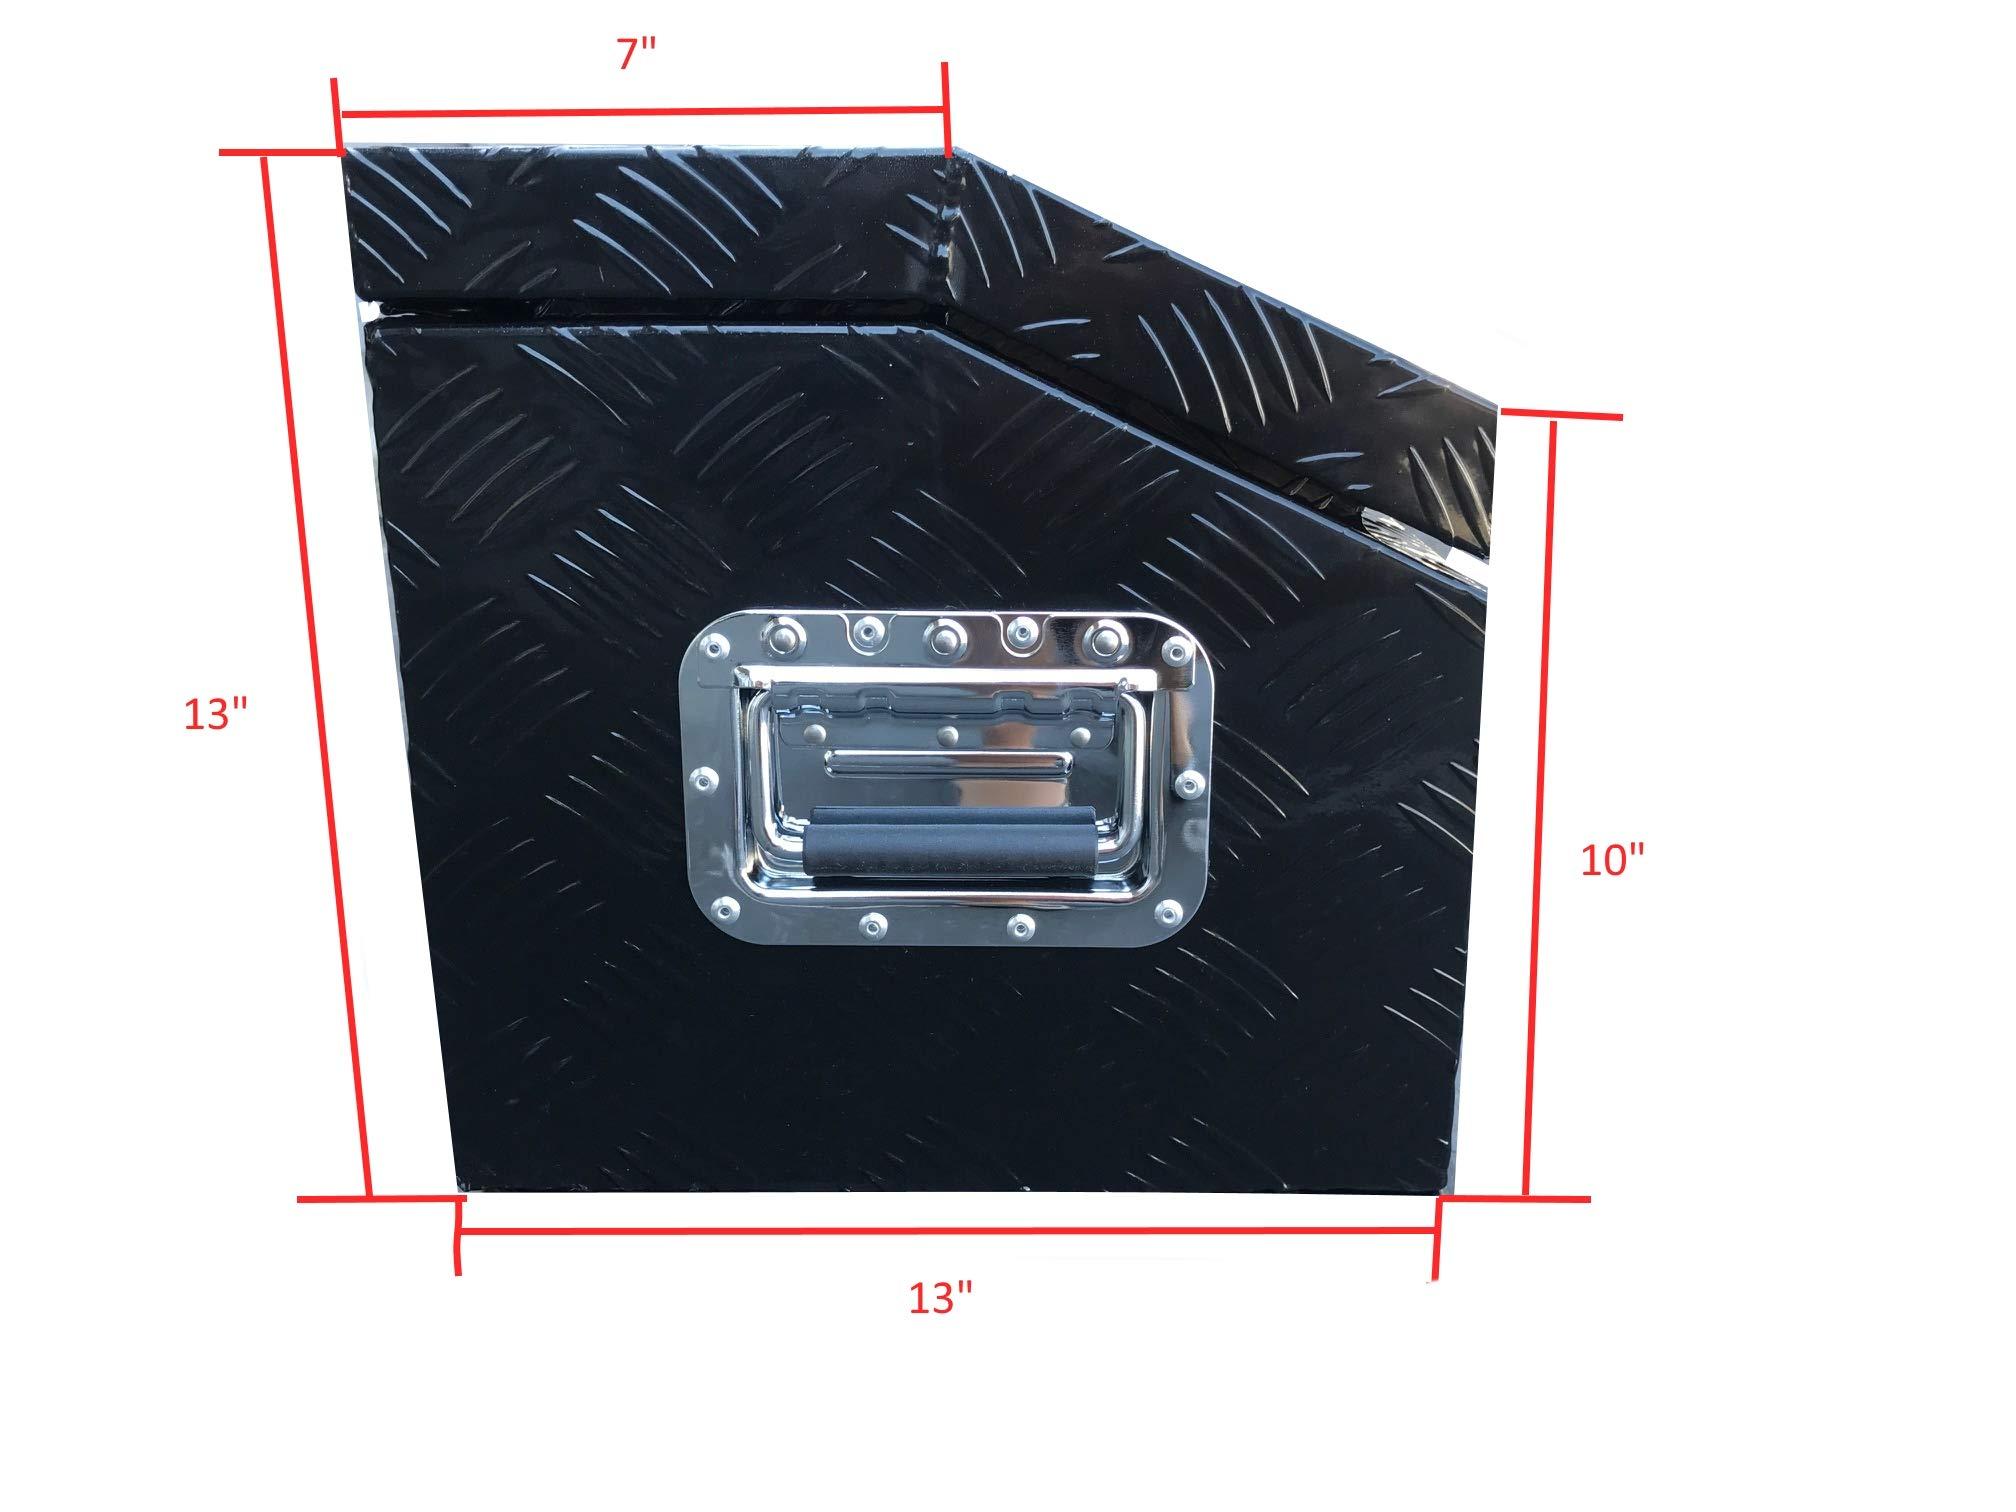 Brait BR302B Aluminum Tool Box for ATV Storage Truck Pickup RV, Black by Brait (Image #4)